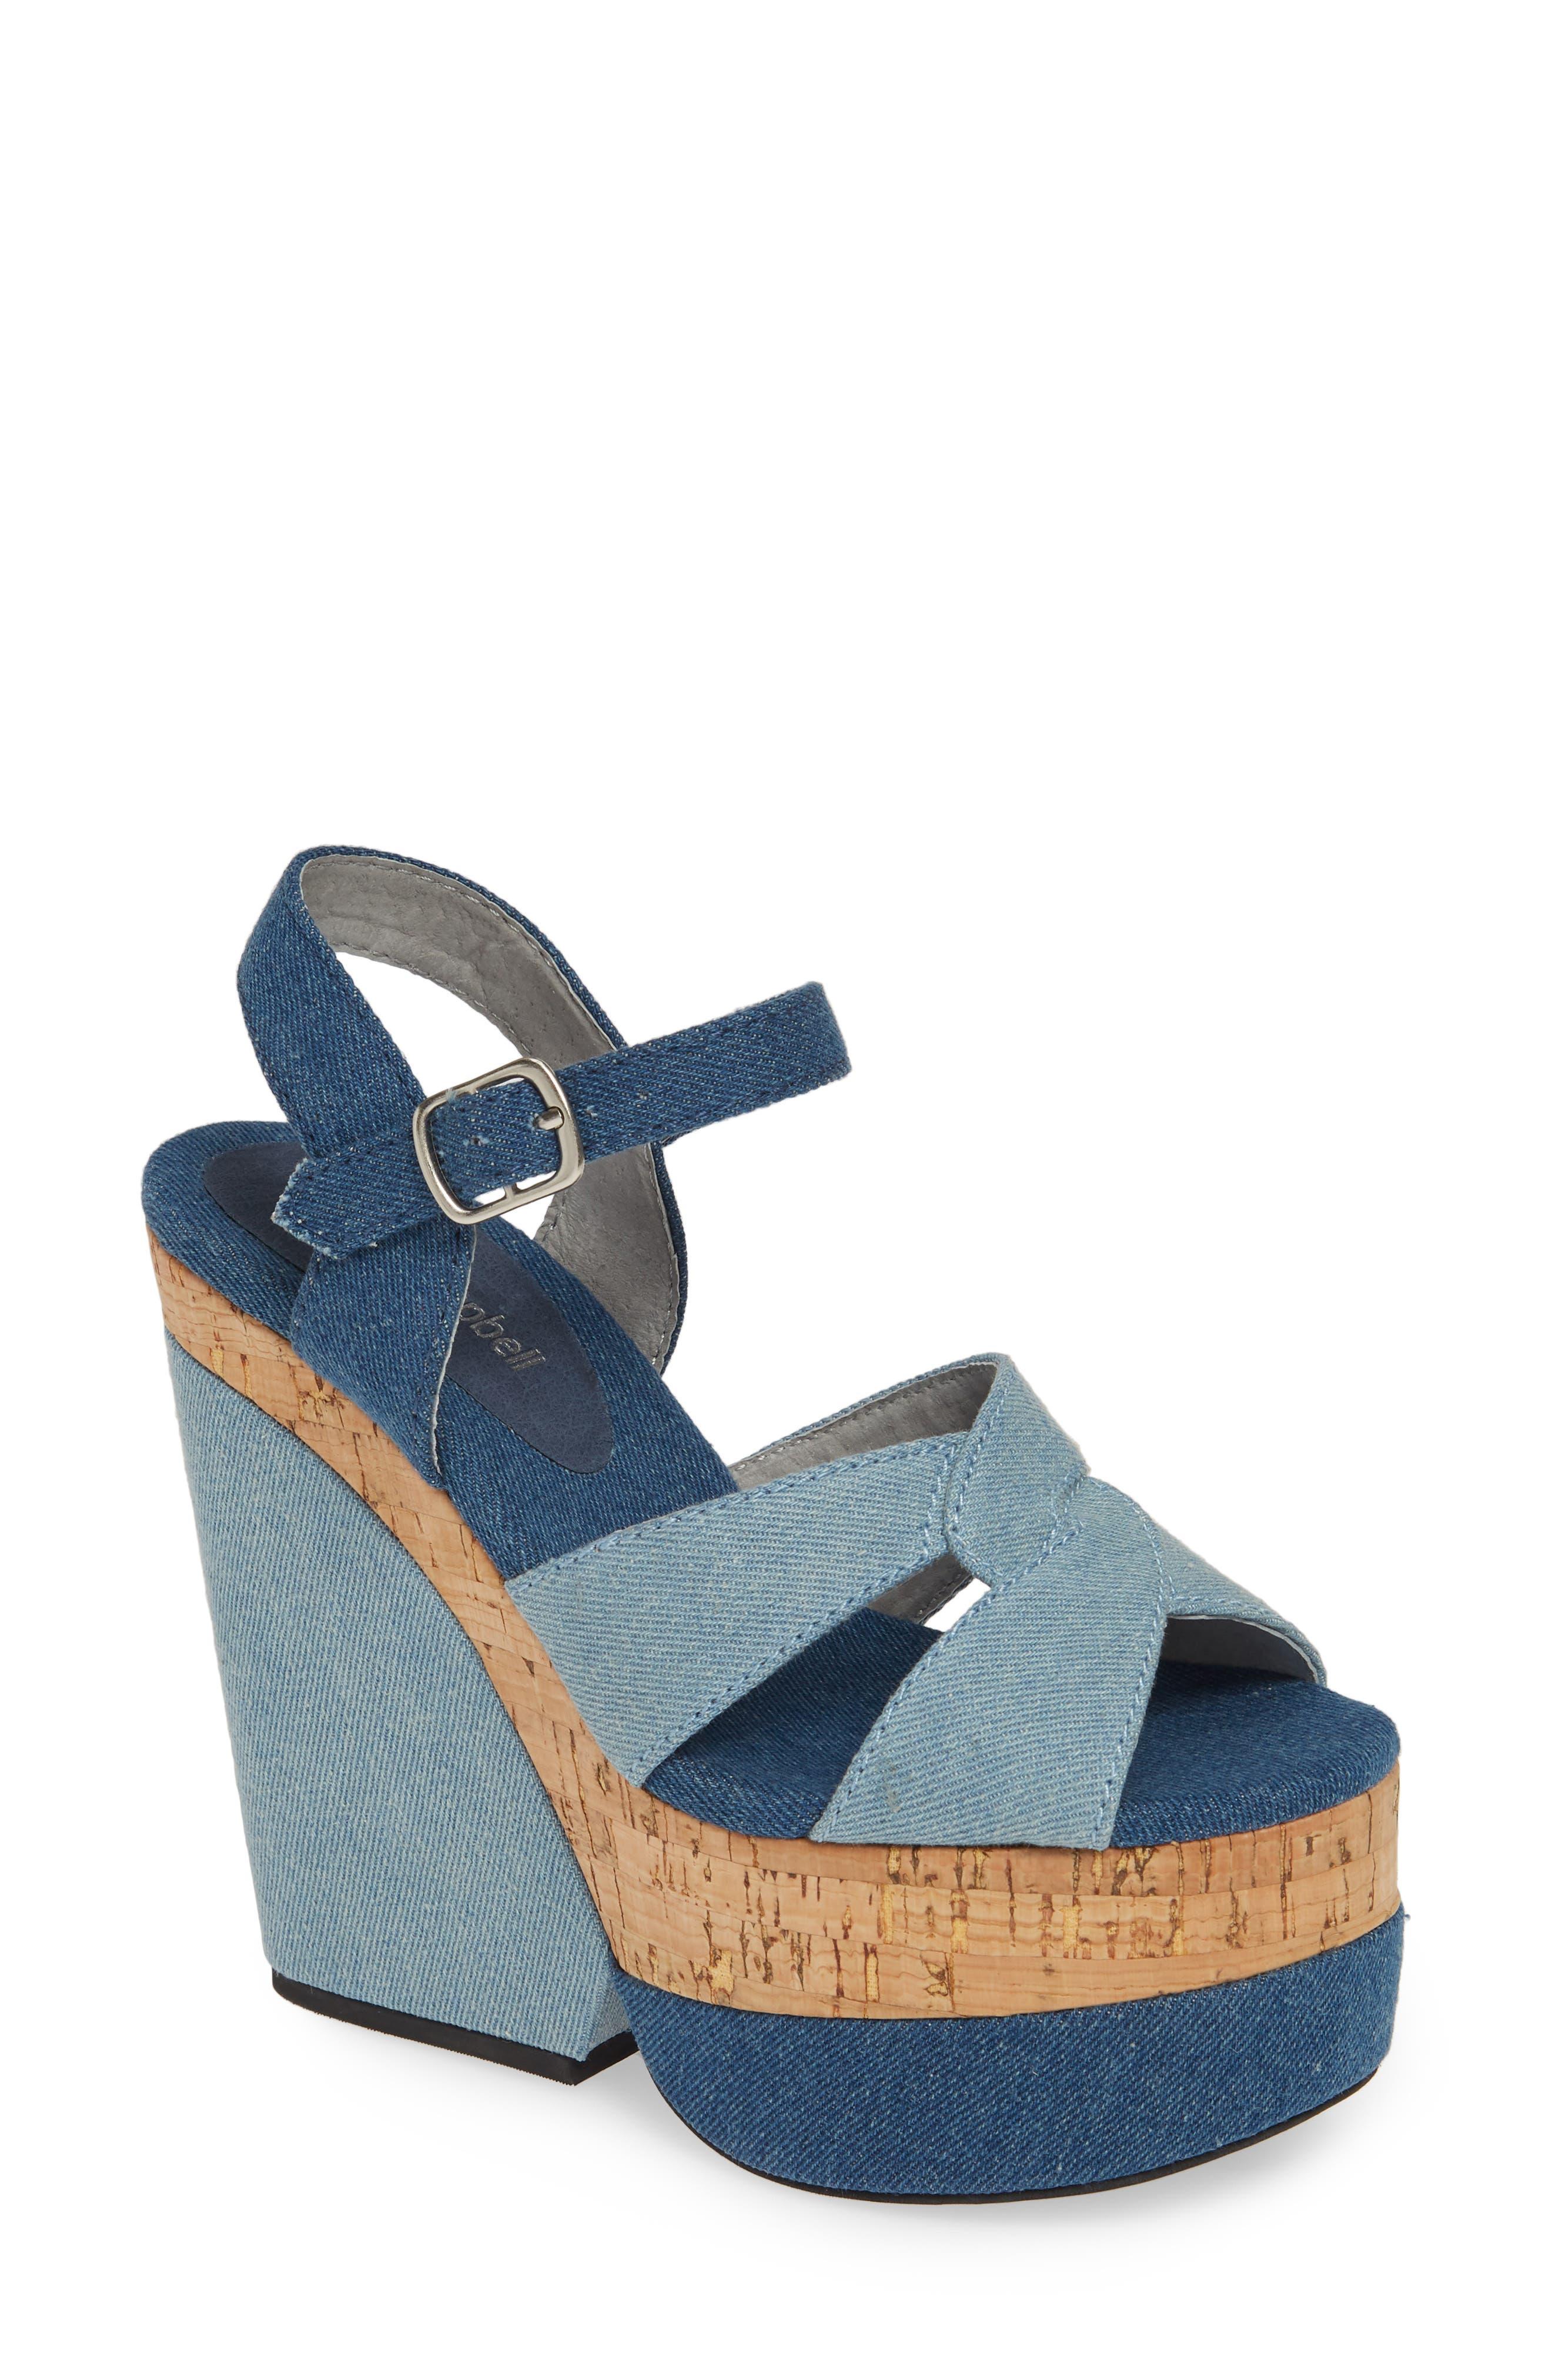 JEFFREY CAMPBELL, Wedge Platform Sandal, Main thumbnail 1, color, BLUE DENIM COMBO/ CORK